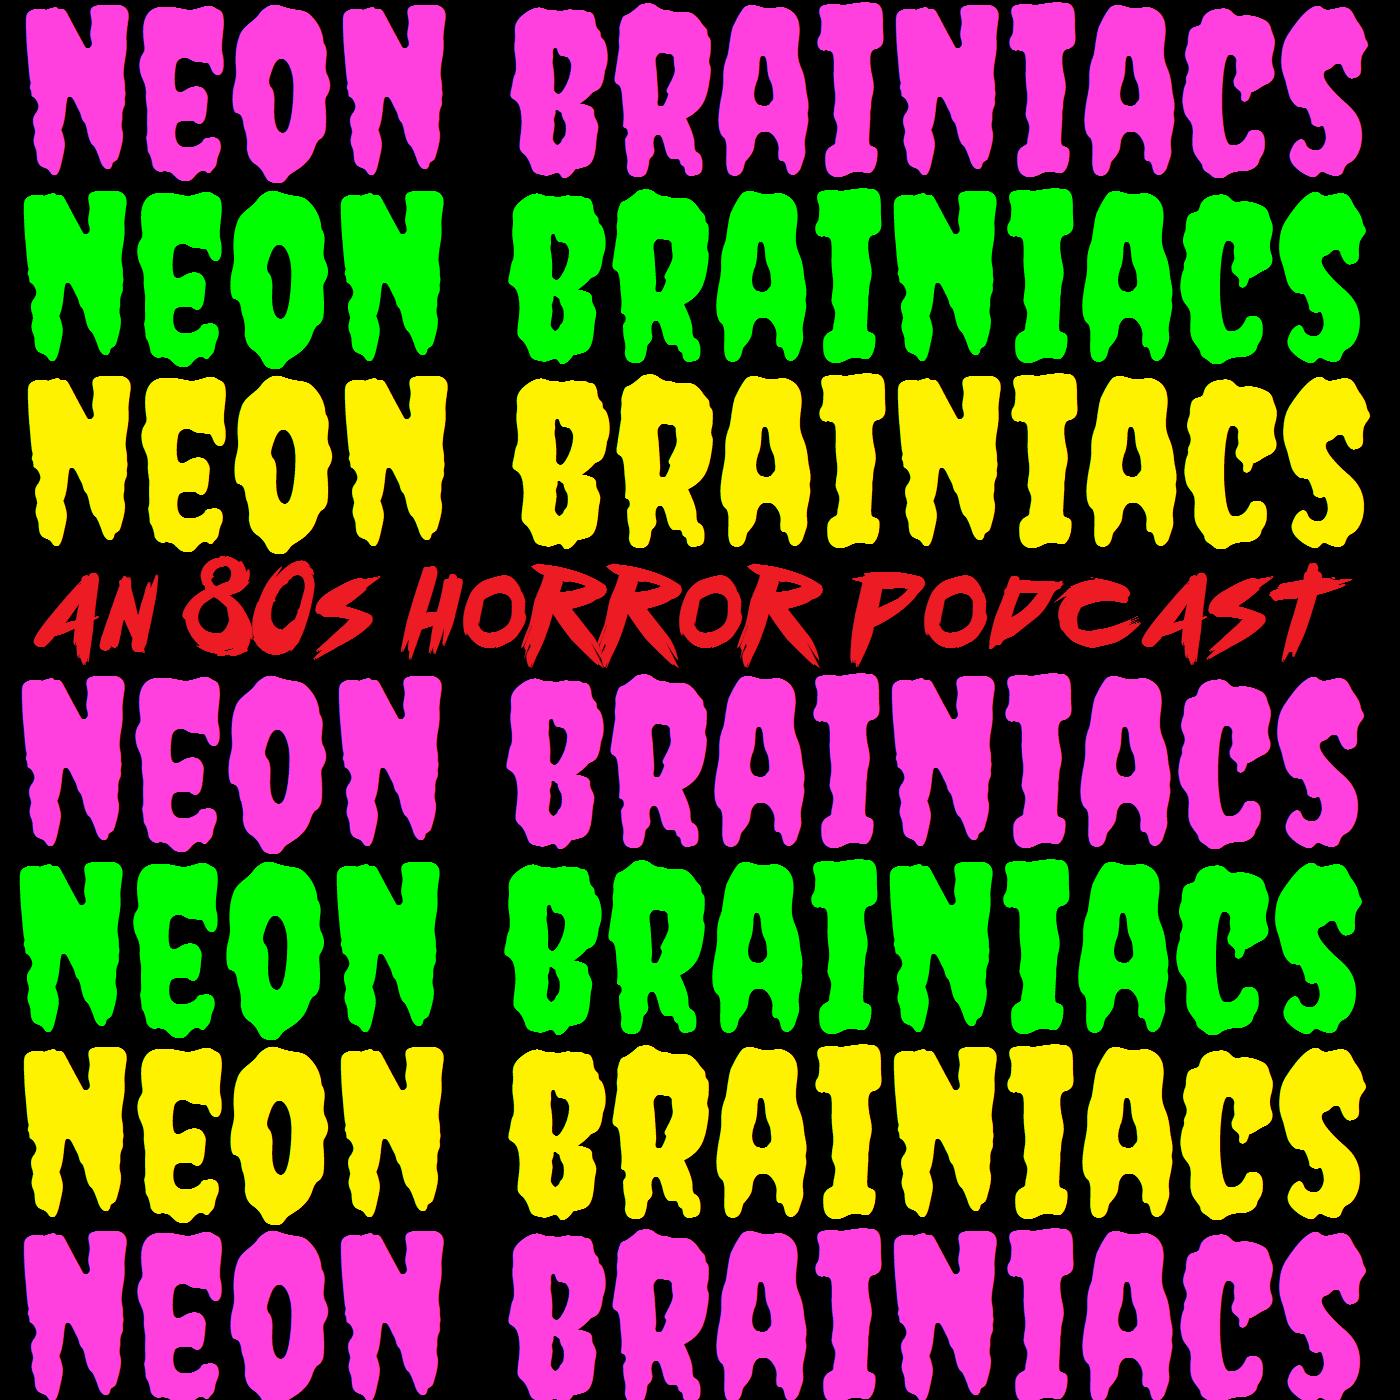 Neon Brainiacs logo